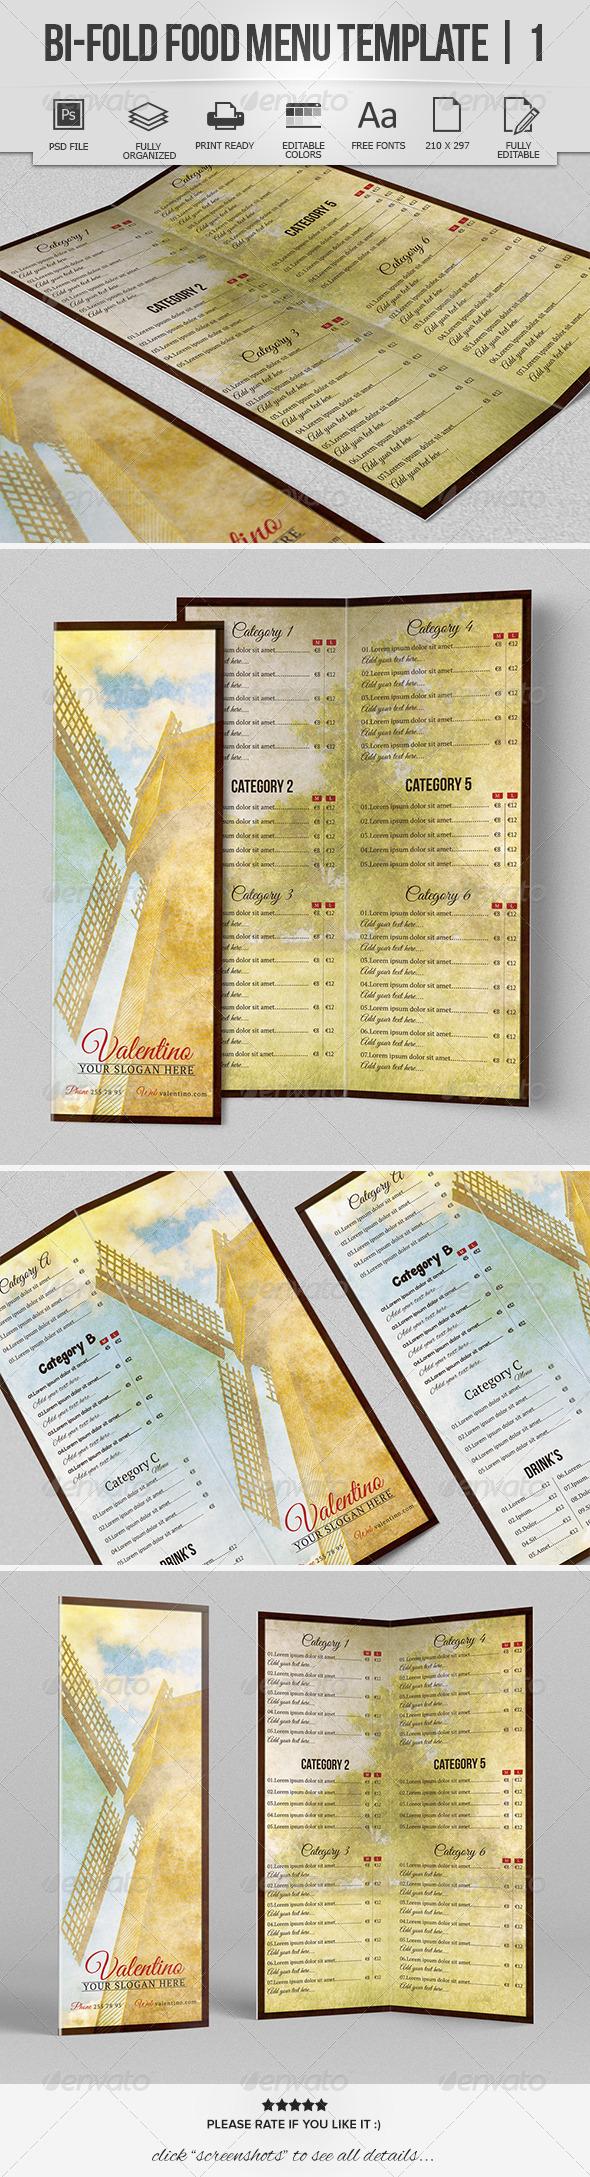 Bi-Fold Food Menu Template | 1 - Food Menus Print Templates